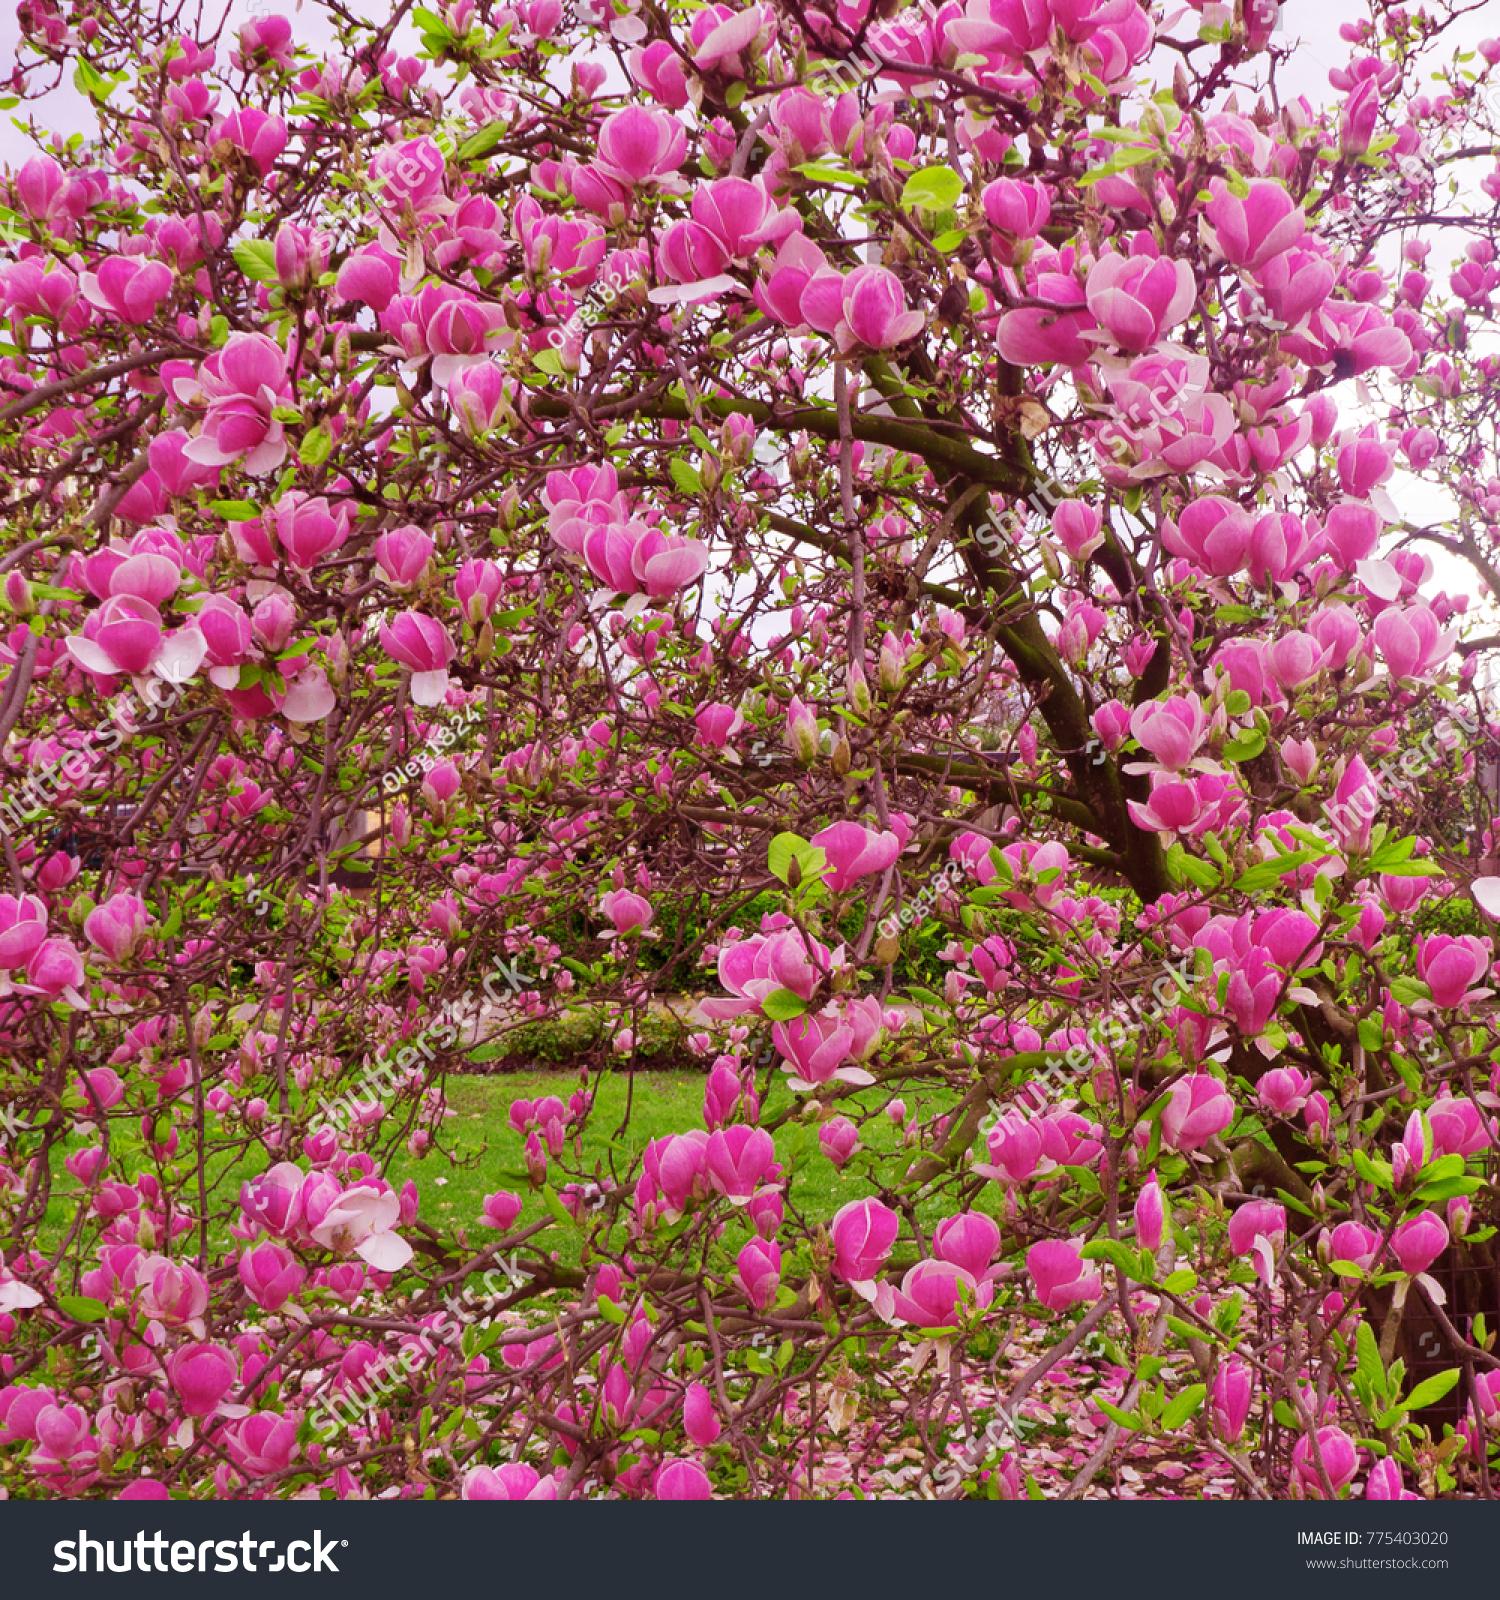 Bloomy Magnolia Tree With Big Pink Flowers Ez Canvas